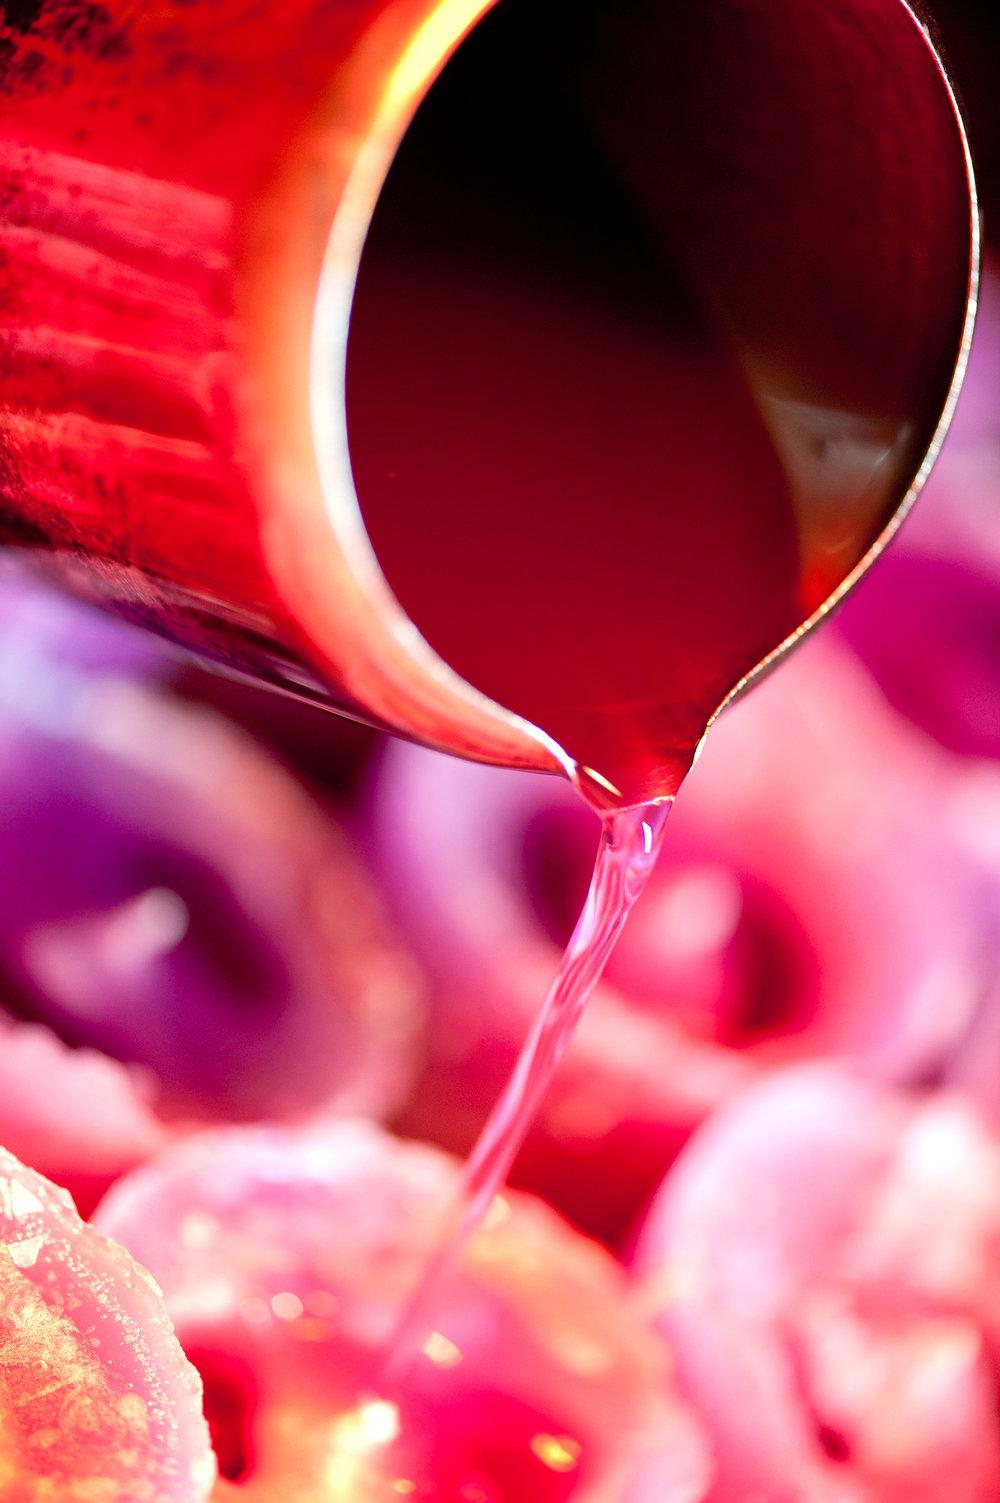 kapula-handmade-hand-poured-candles-wax.jpg